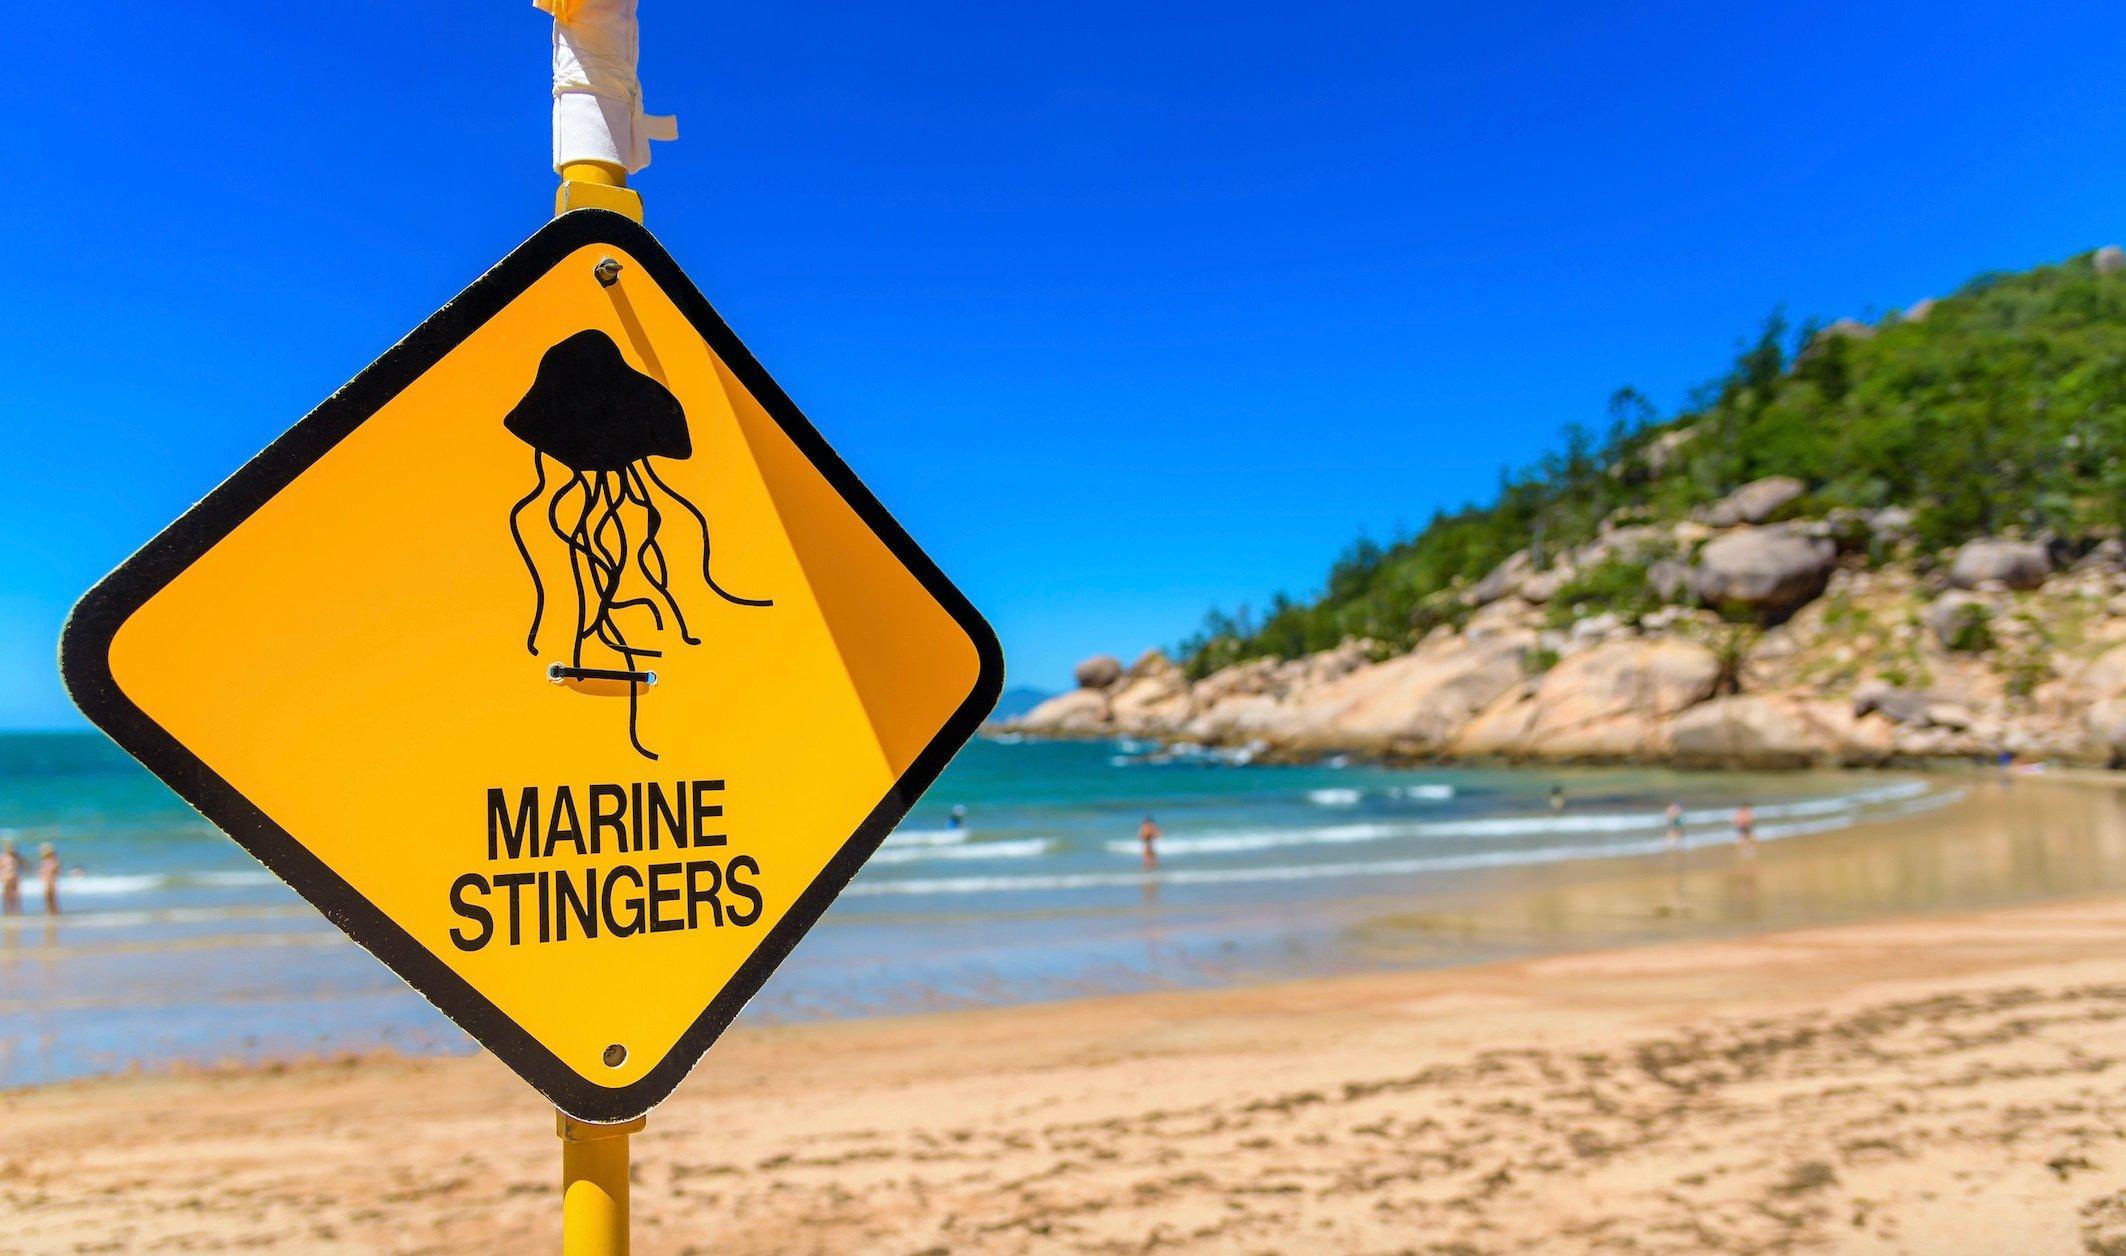 marine stingers beach sign